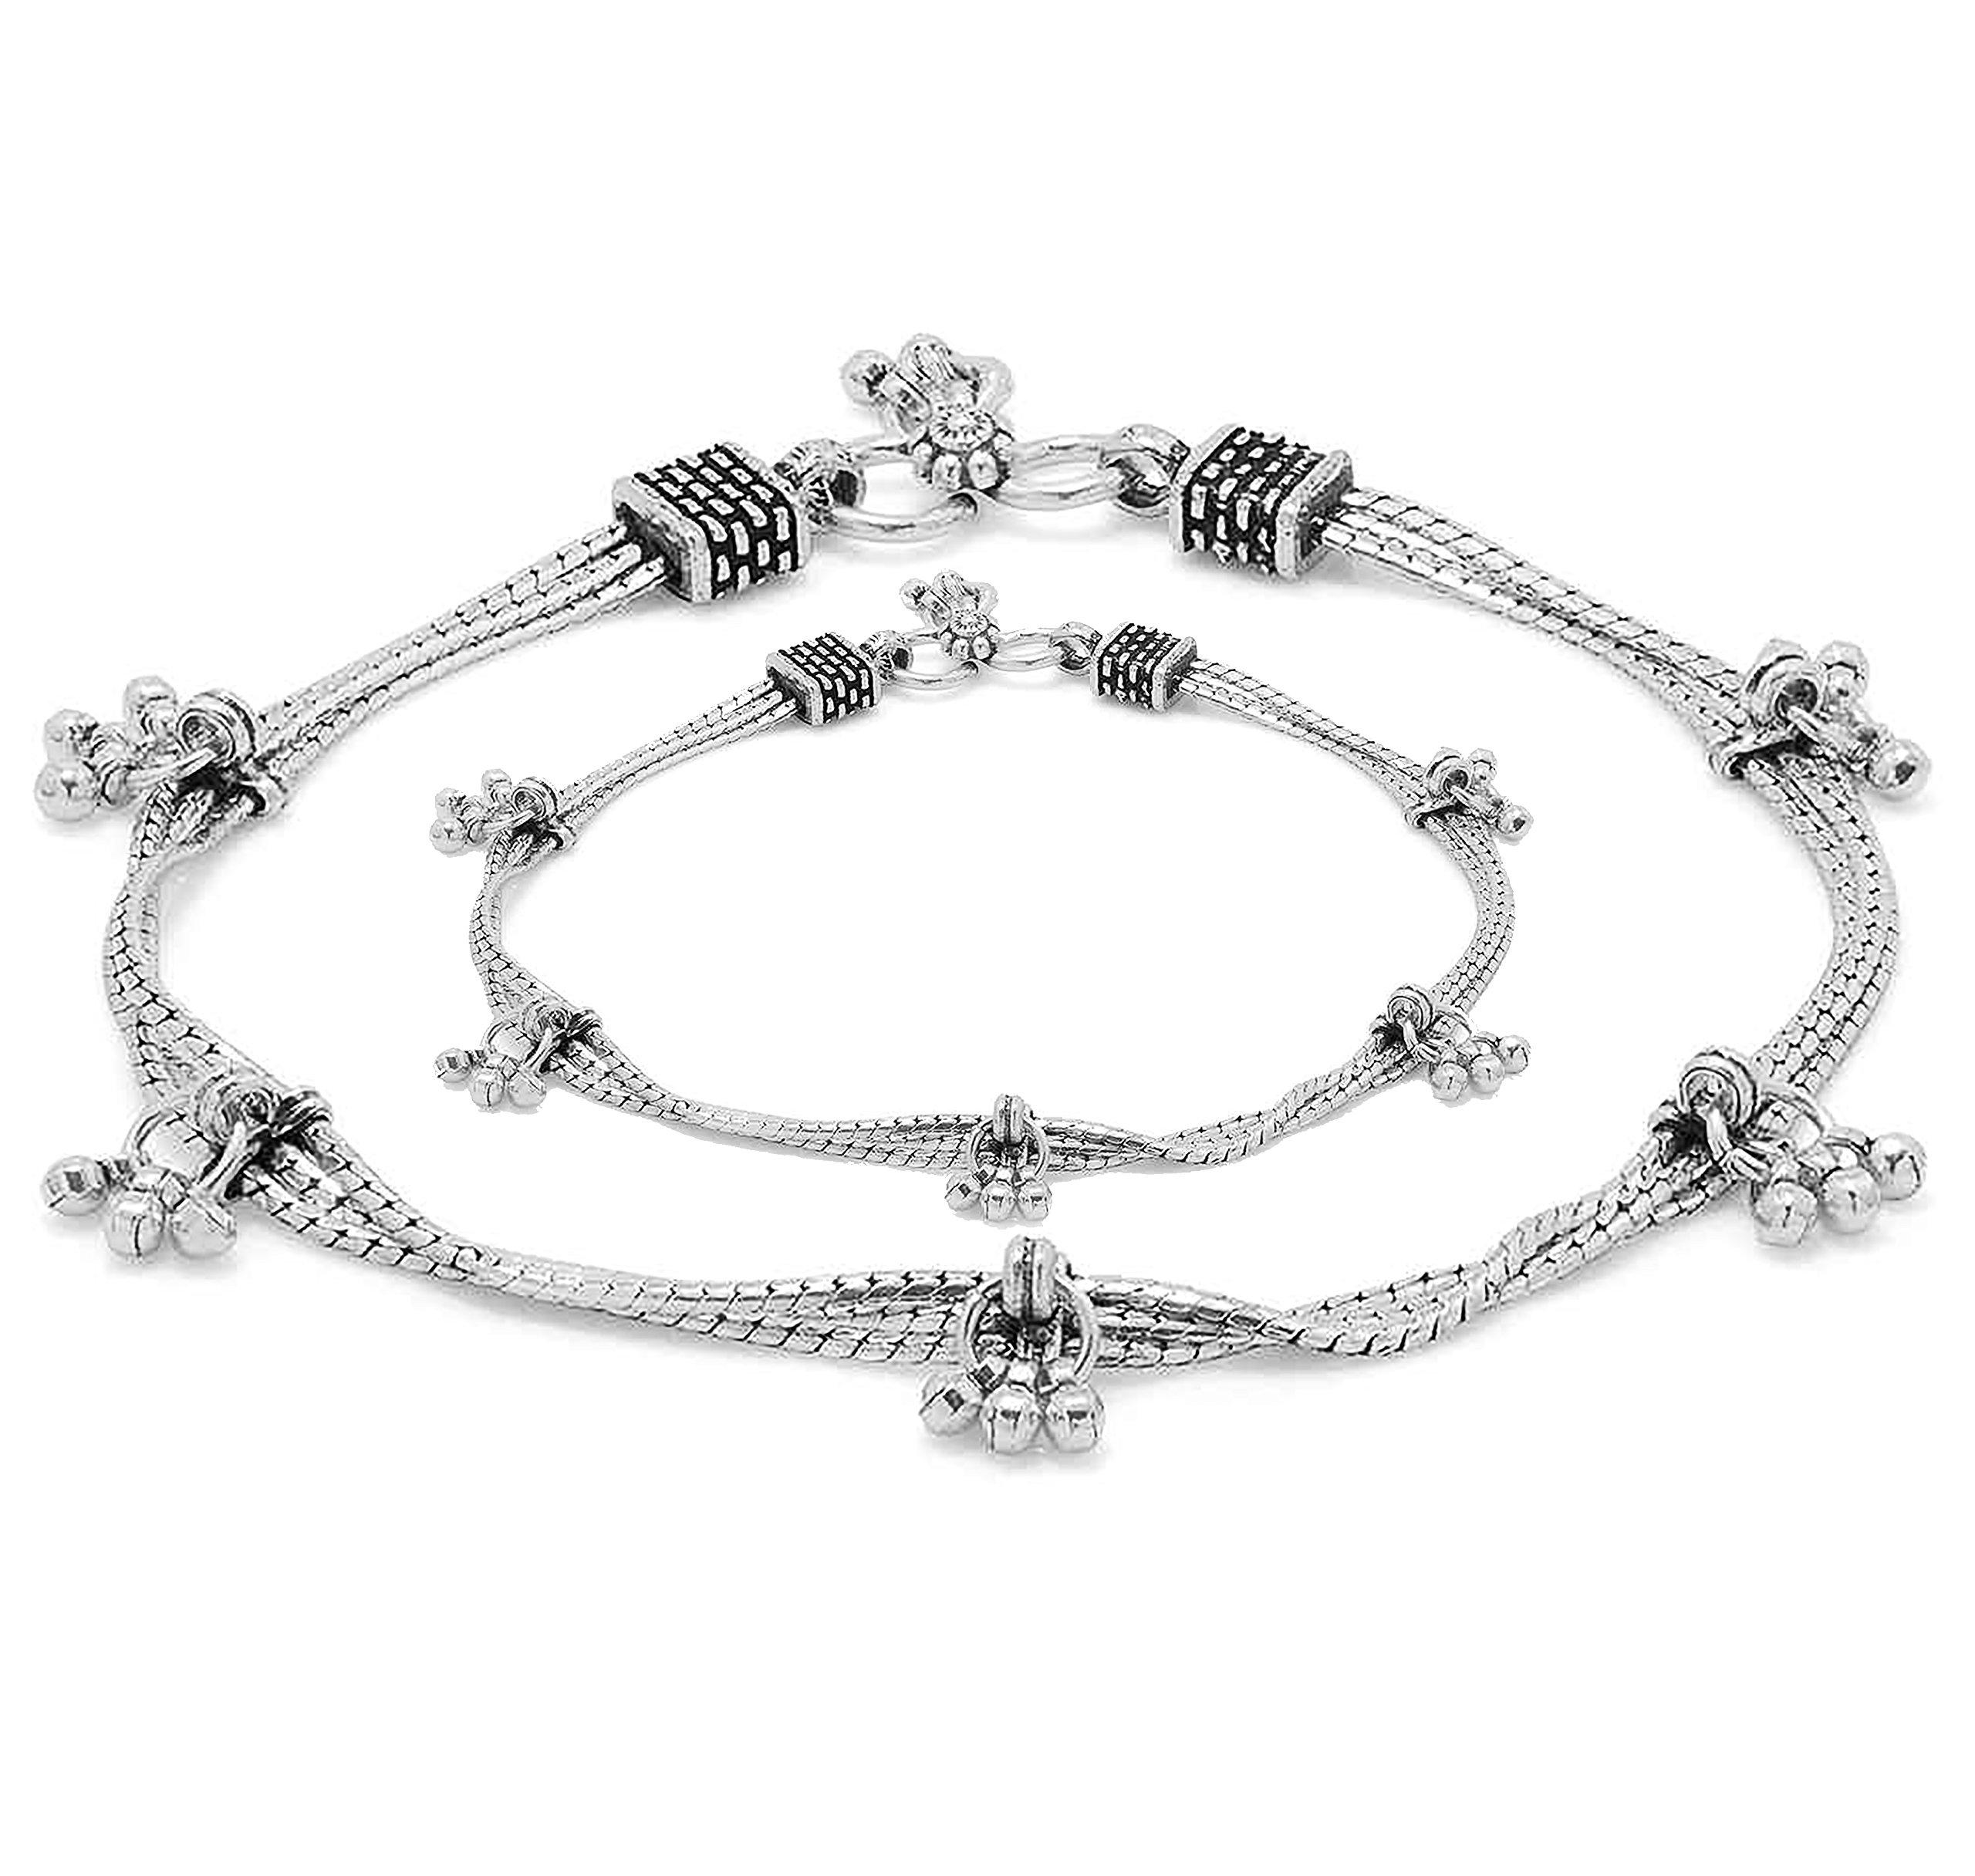 D&D Crafts 925 Sterling Silver Astonishing Link Anklets For Girls, Women